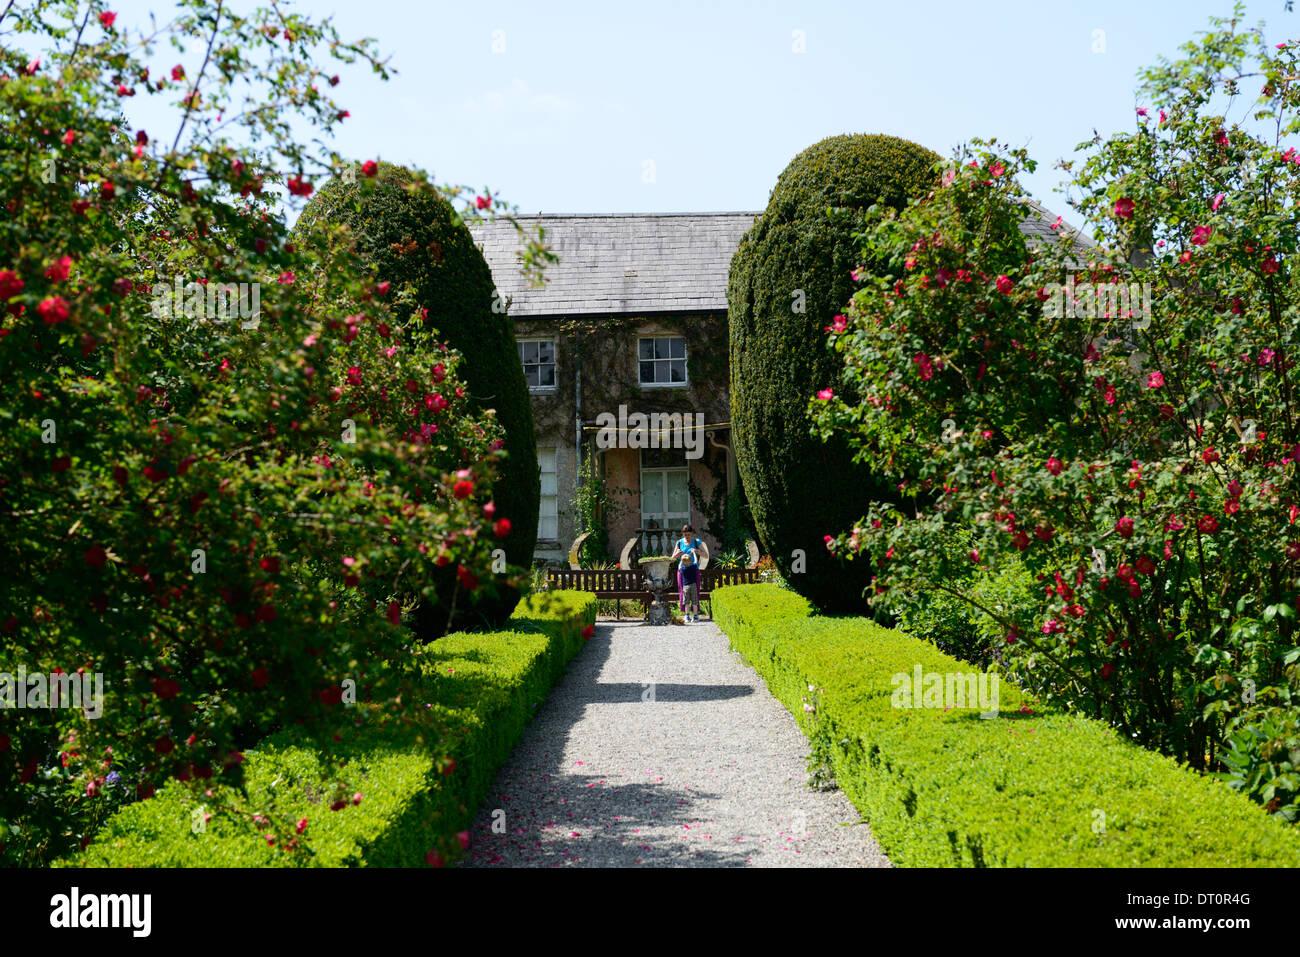 altamont house and garden yew box hedge hedging carlow ireland corona north - Stock Image